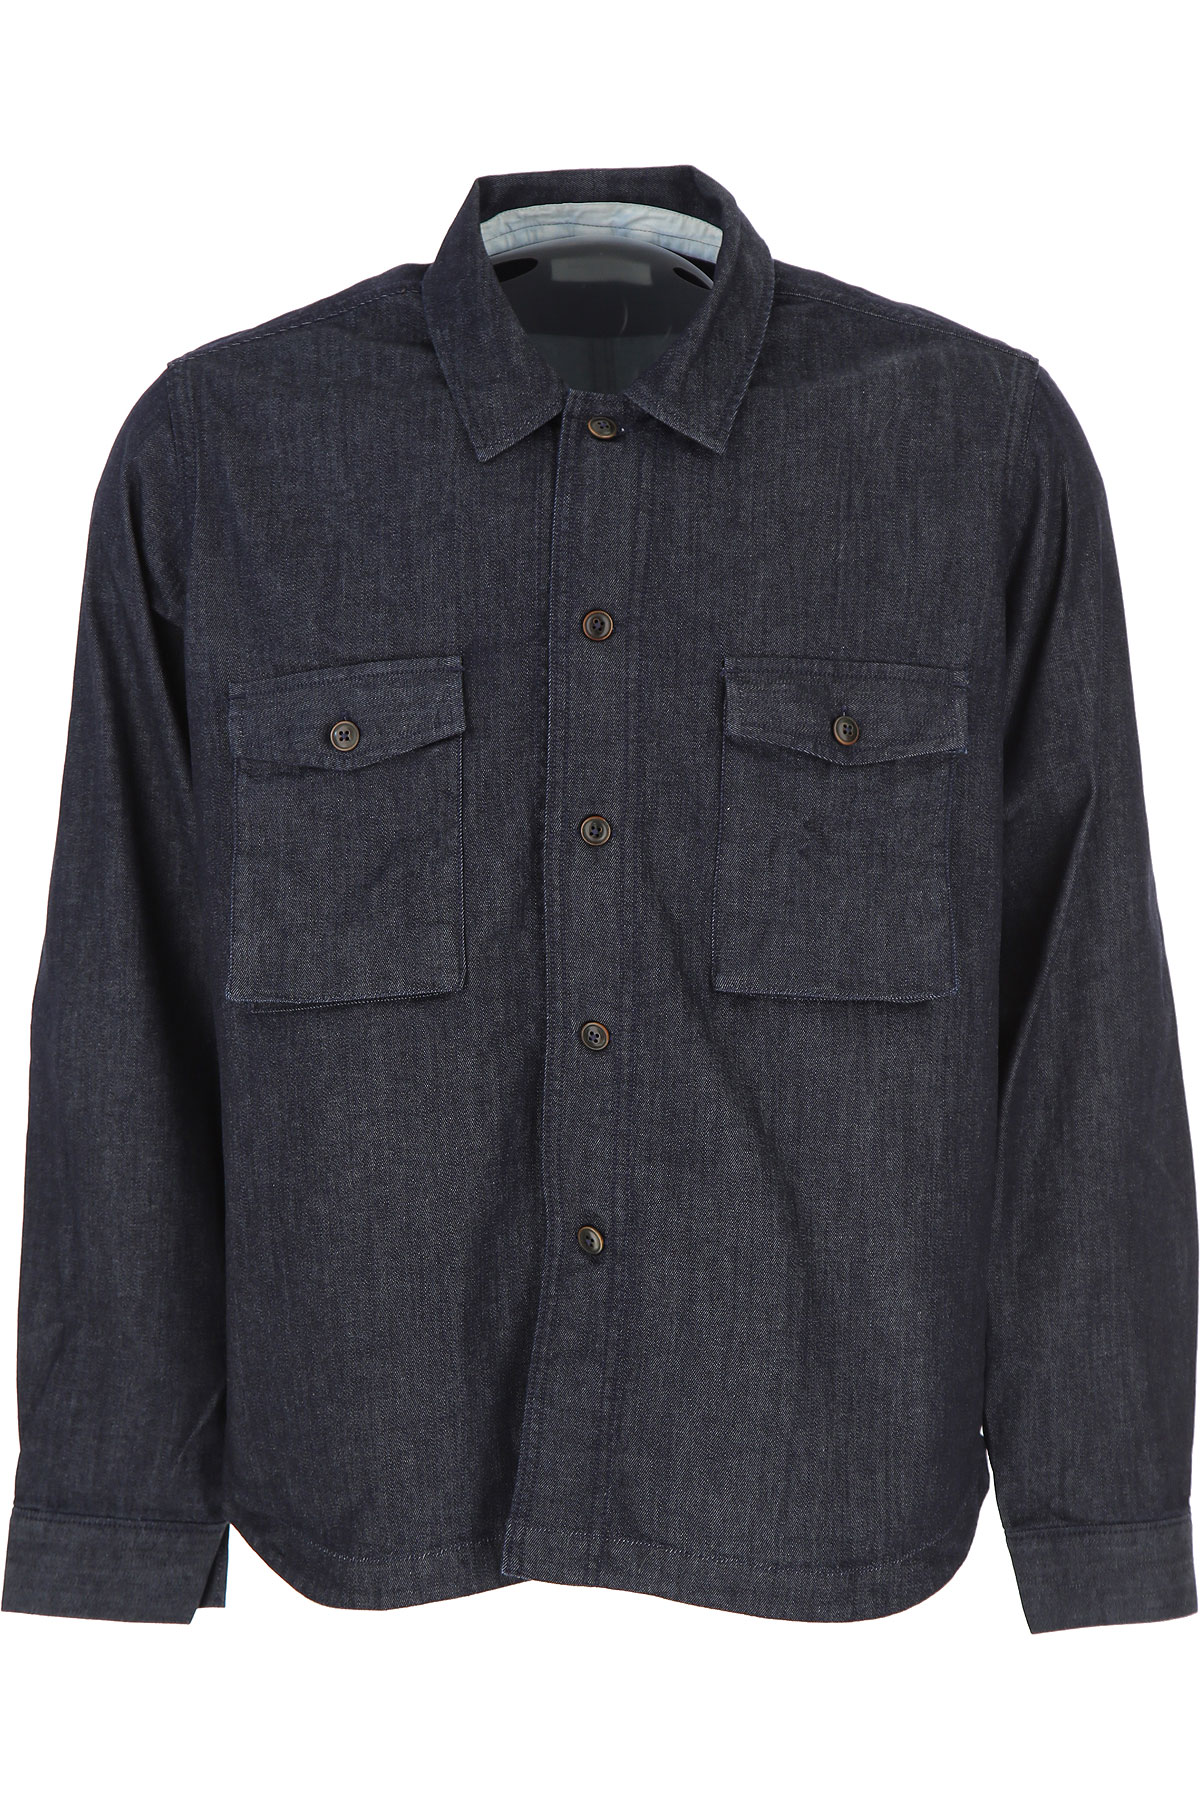 Image of Tintoria Mattei 954 Shirt for Men, Dark Blue Denim, Cotton, 2017, 15.5 15.75 16 16.5 17 17.5